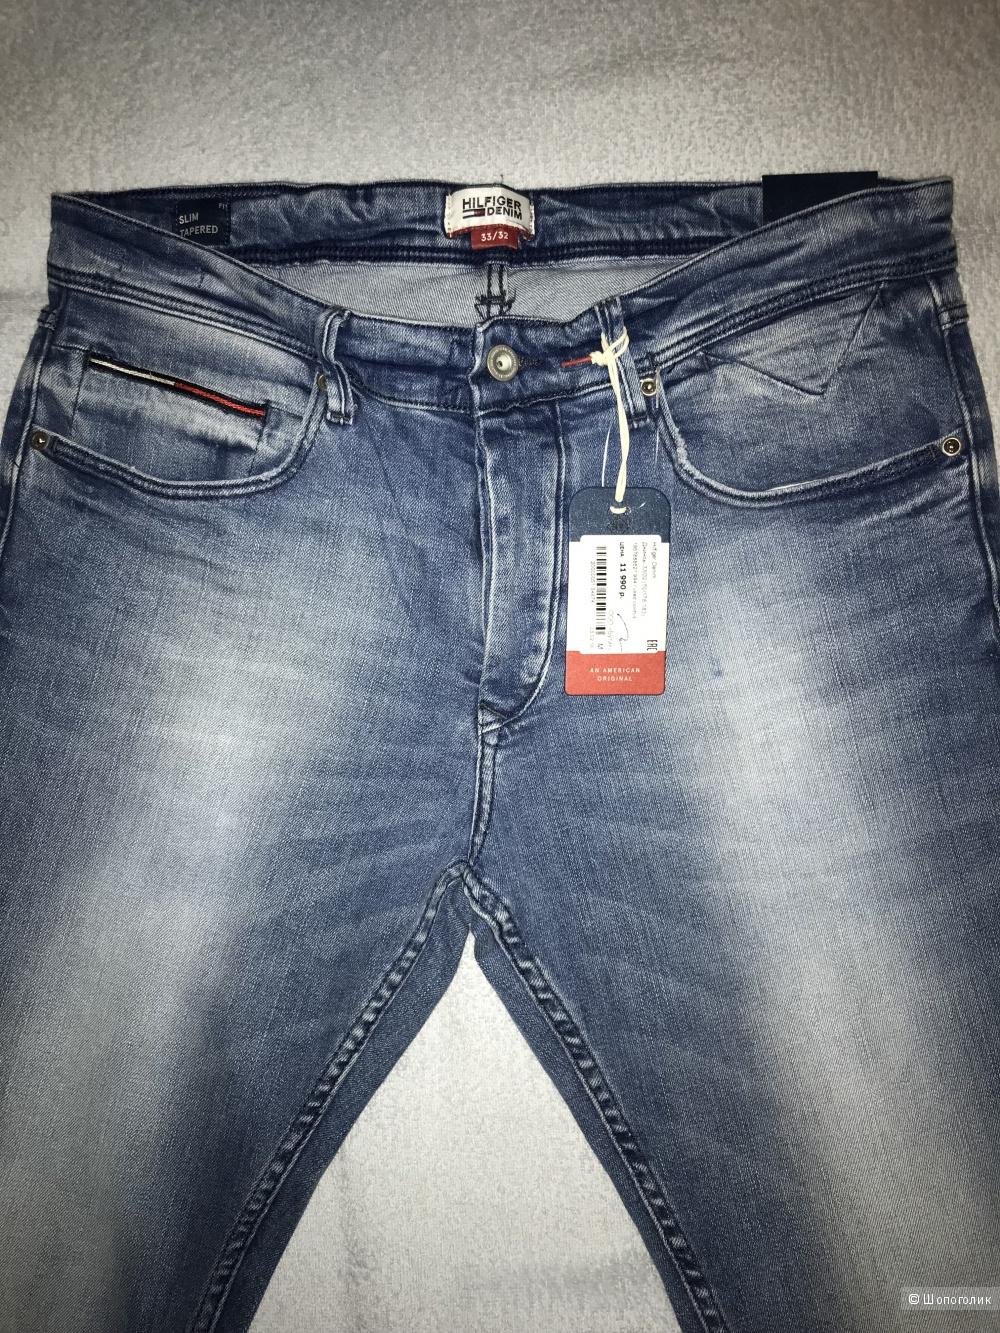 Мужские джинсы Tommy Hilfiger, размер W33 L 32